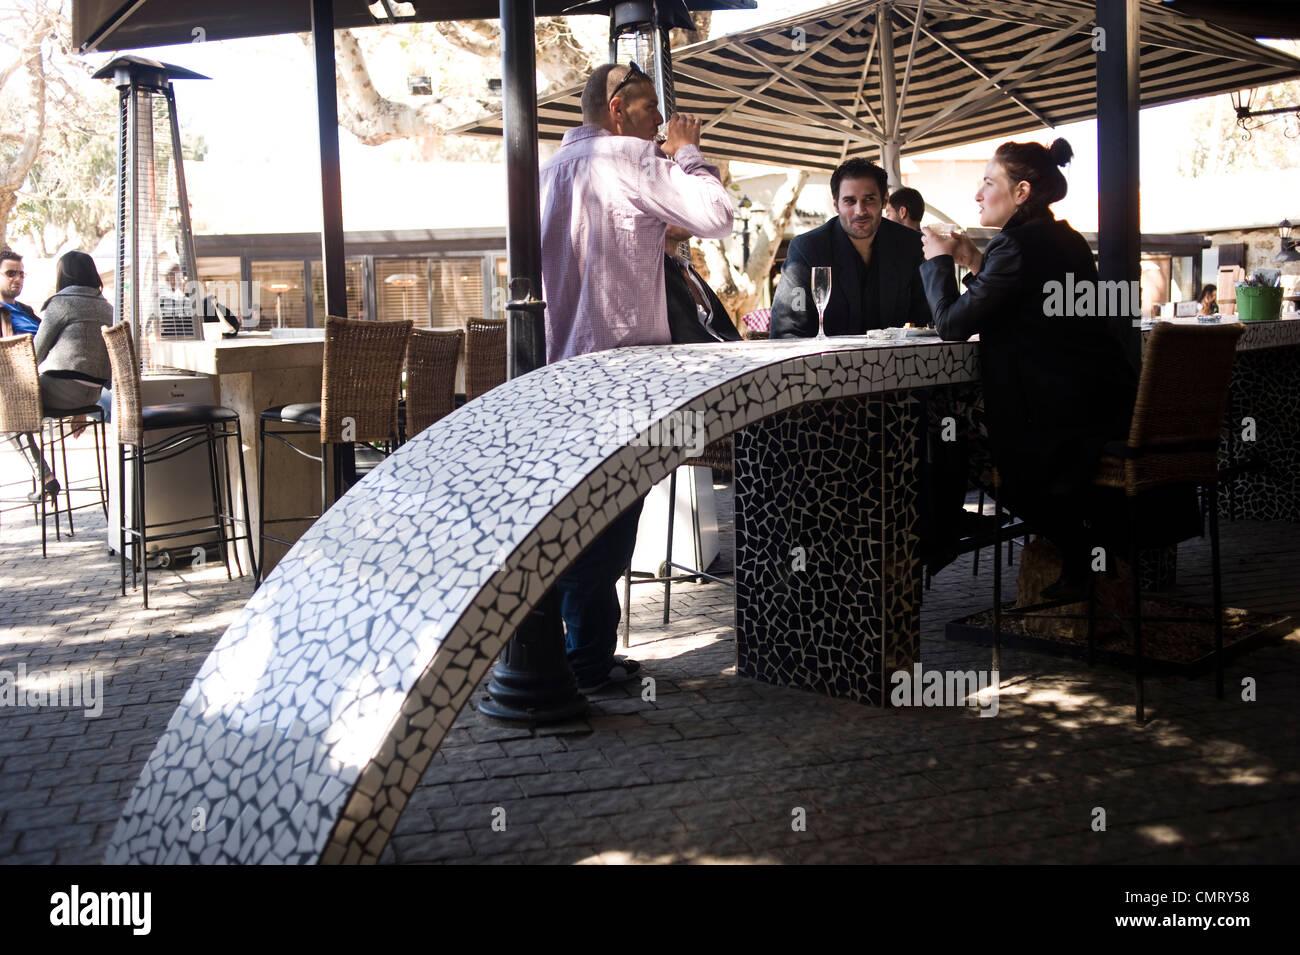 Bar Vicky Cristina, Tel Aviv, Israel. - Stock Image